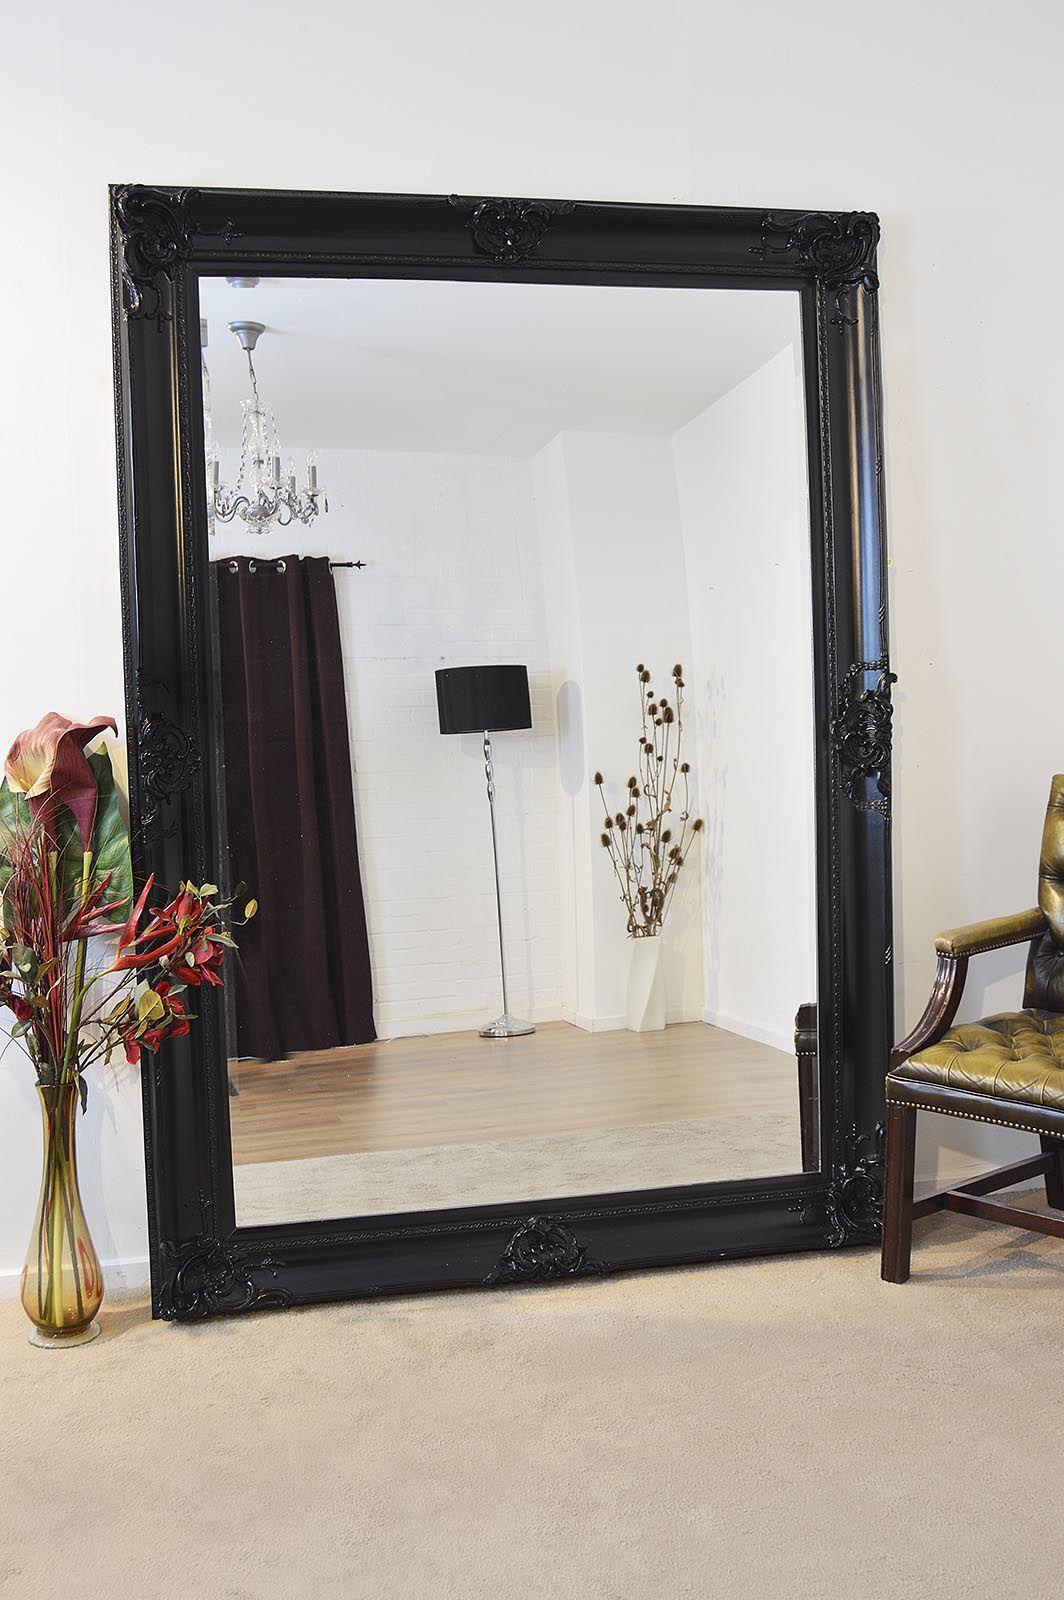 Honiton Extra Large Black Mirror 213x152cm Soraya Interiors Uk Large Black Mirror Black Mirror Frame Large Floor Mirror